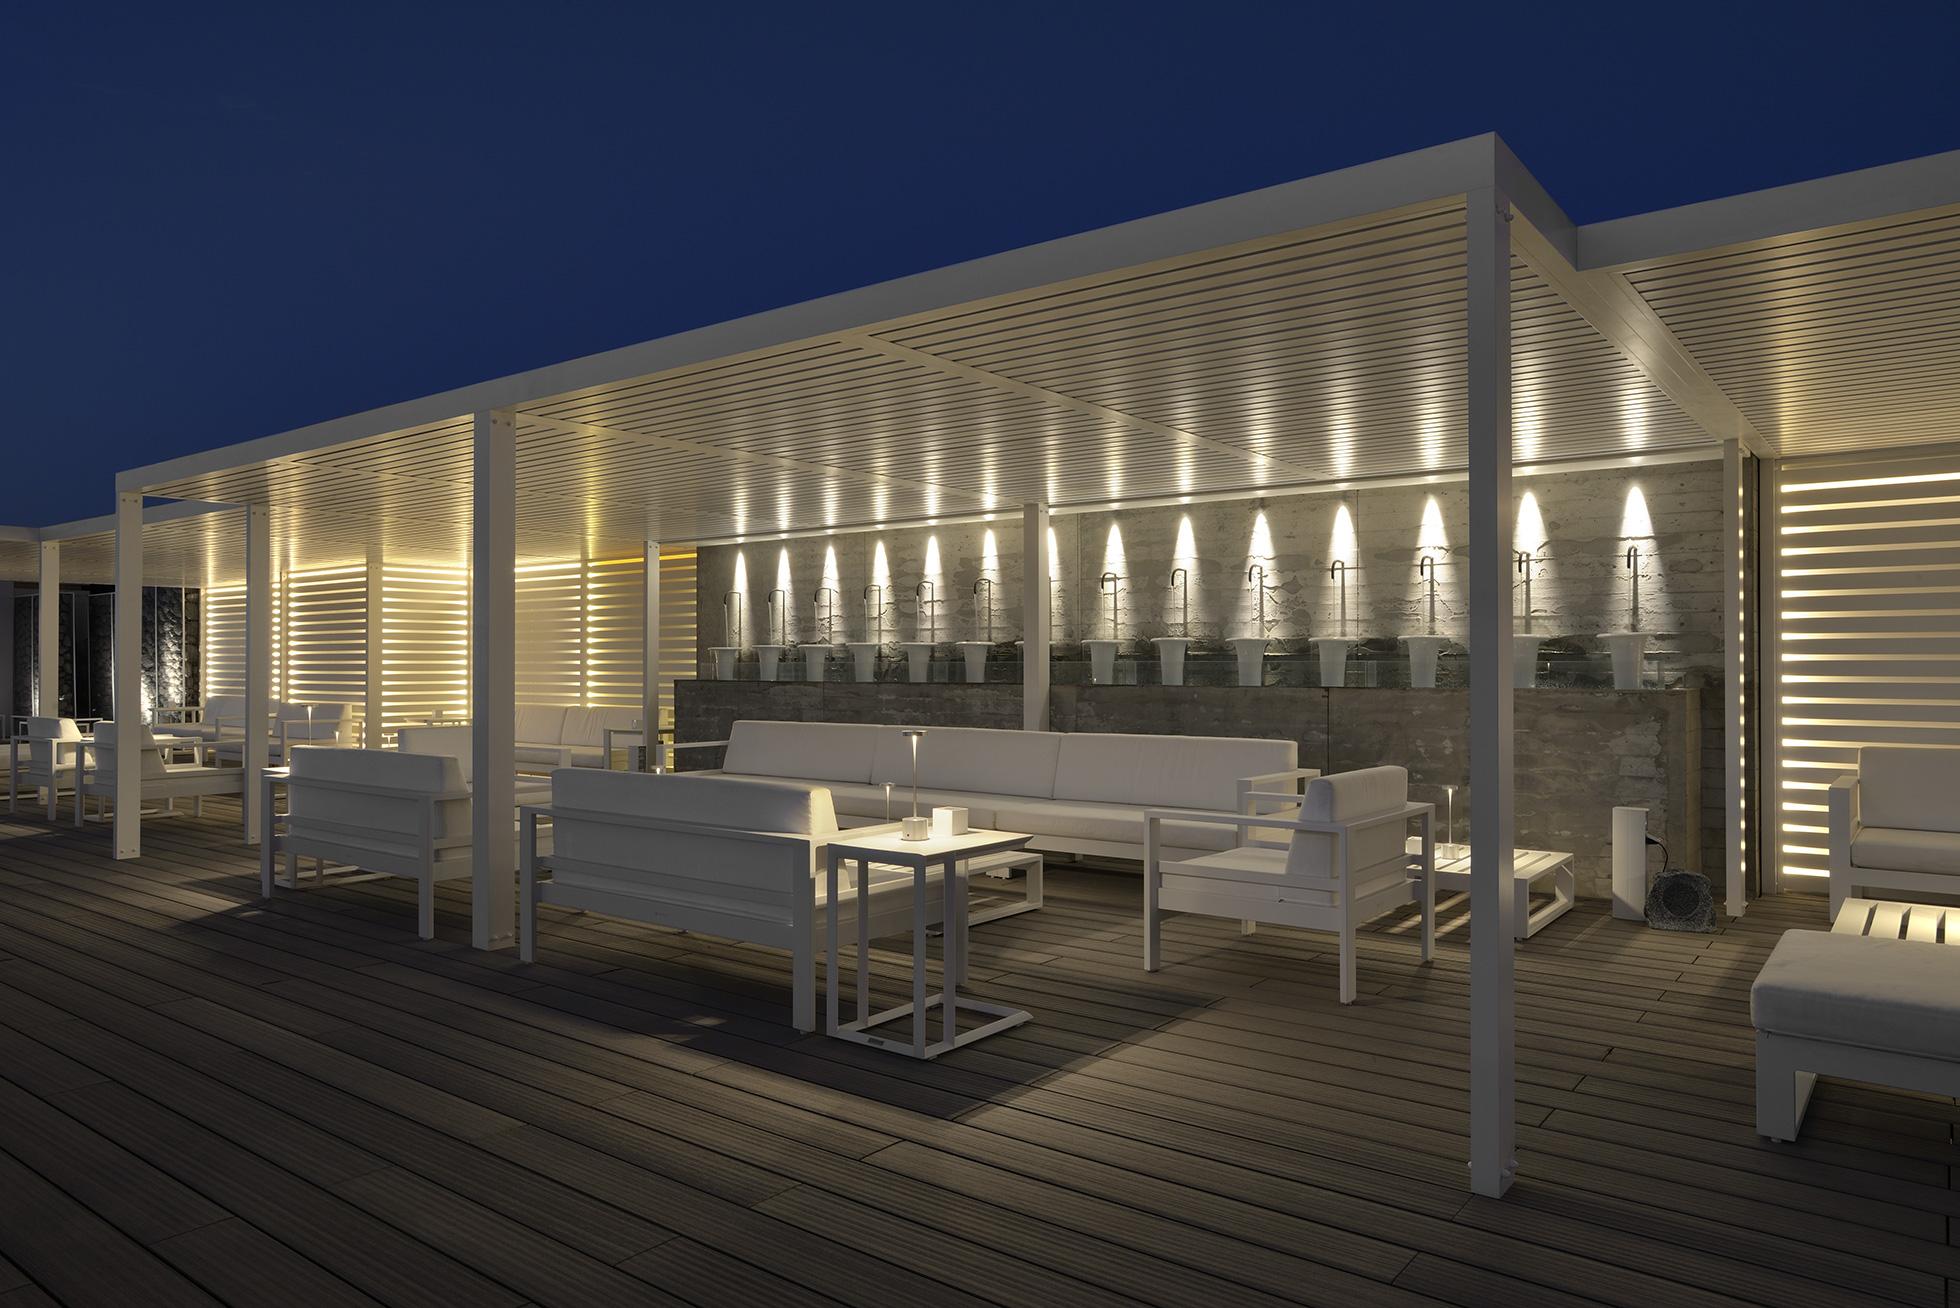 Florio terrazza luminae lighting design for Terrazza design